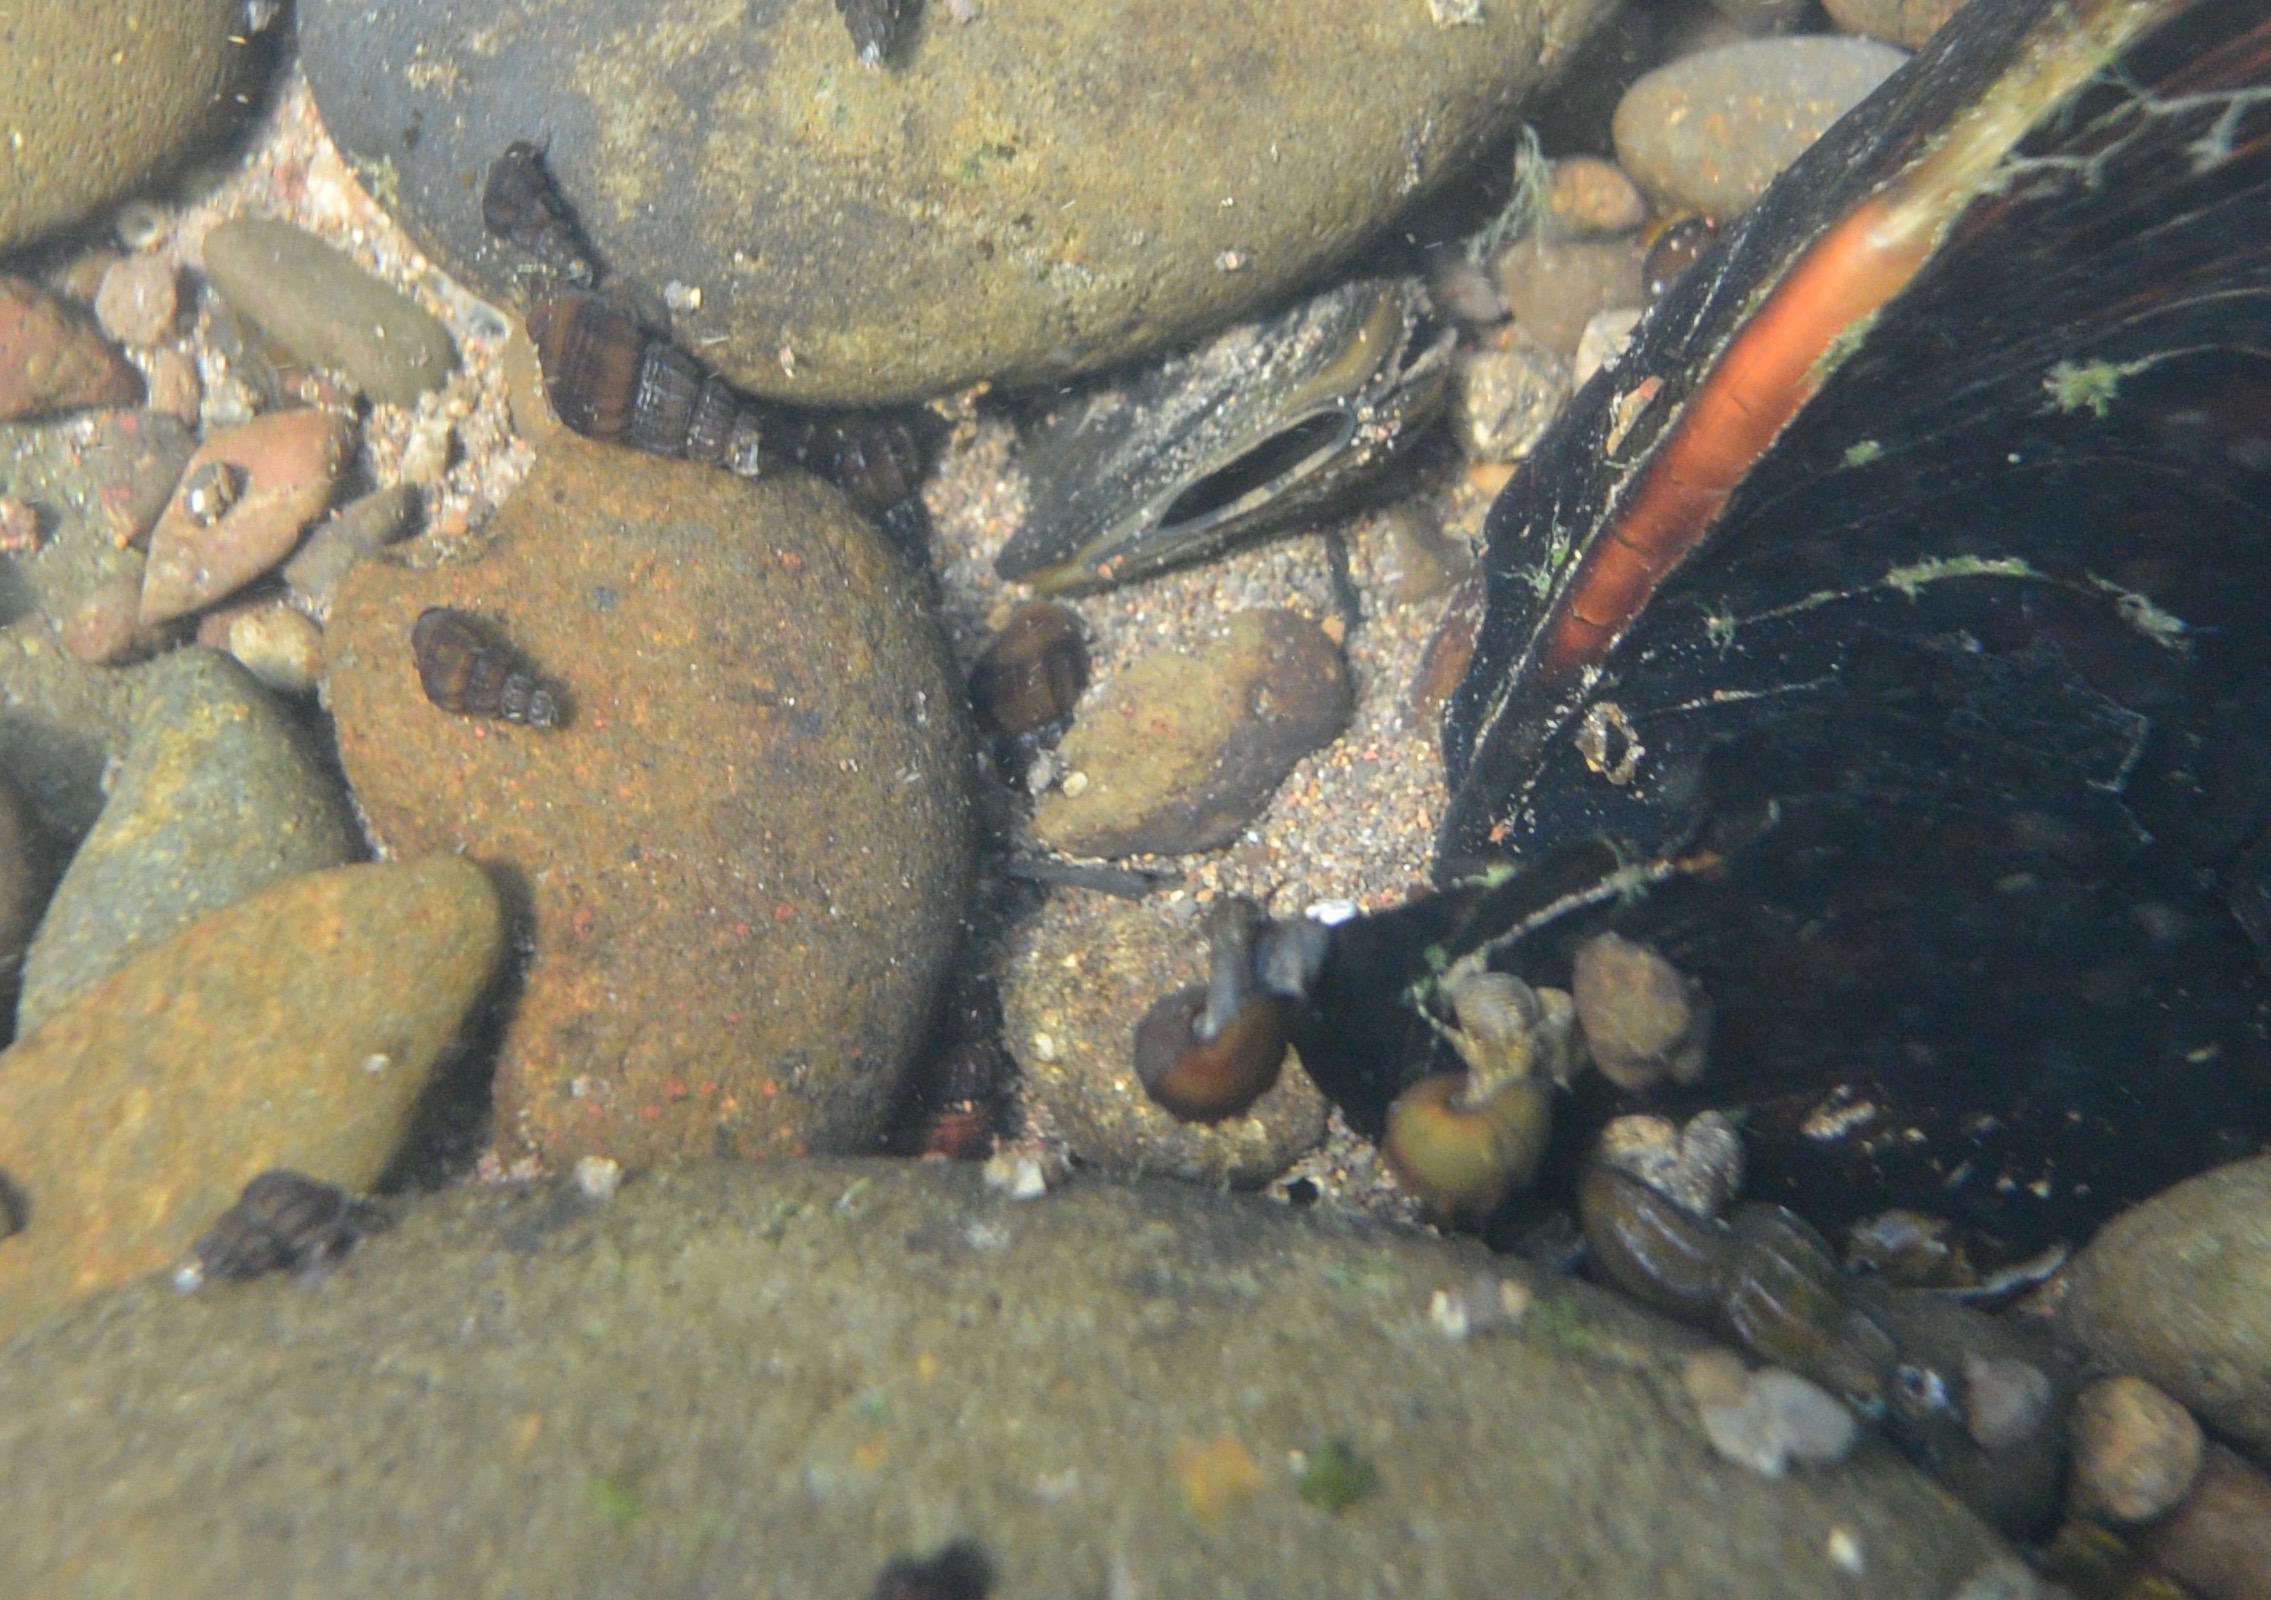 Here a juvenile mussel on the mainstem Willamette (summer of 2017), near Eugene.